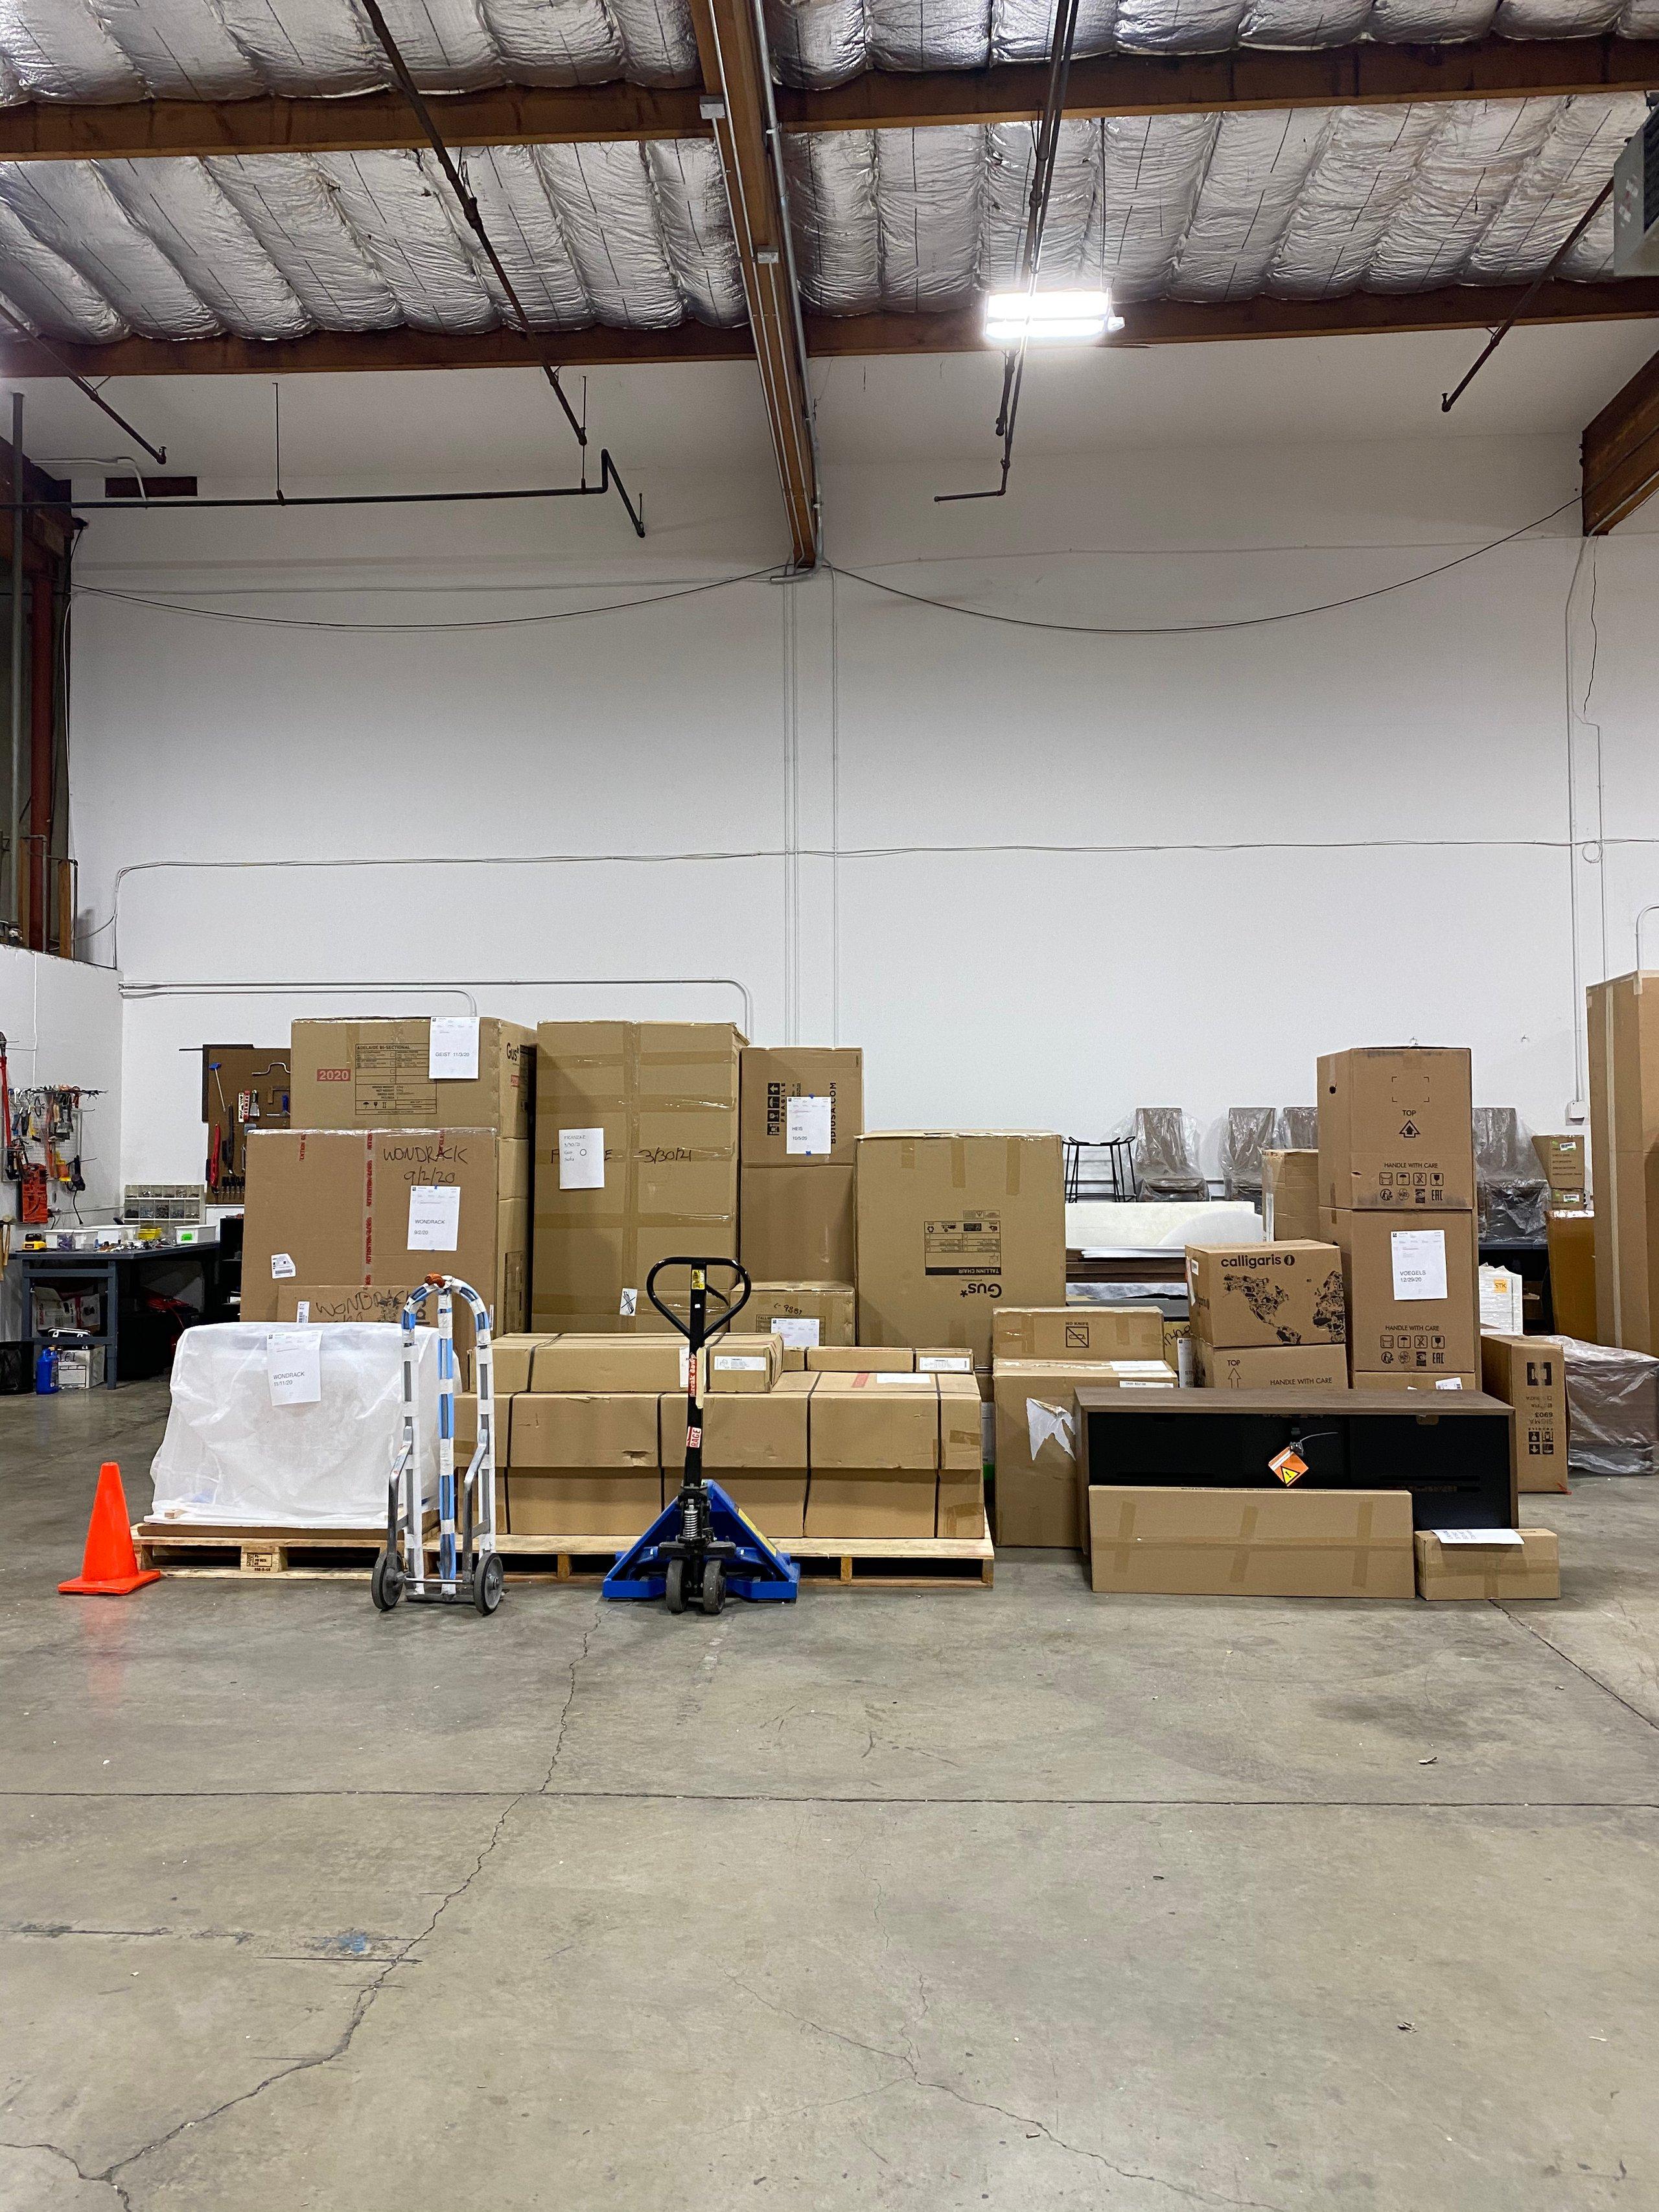 6x6 Warehouse self storage unit